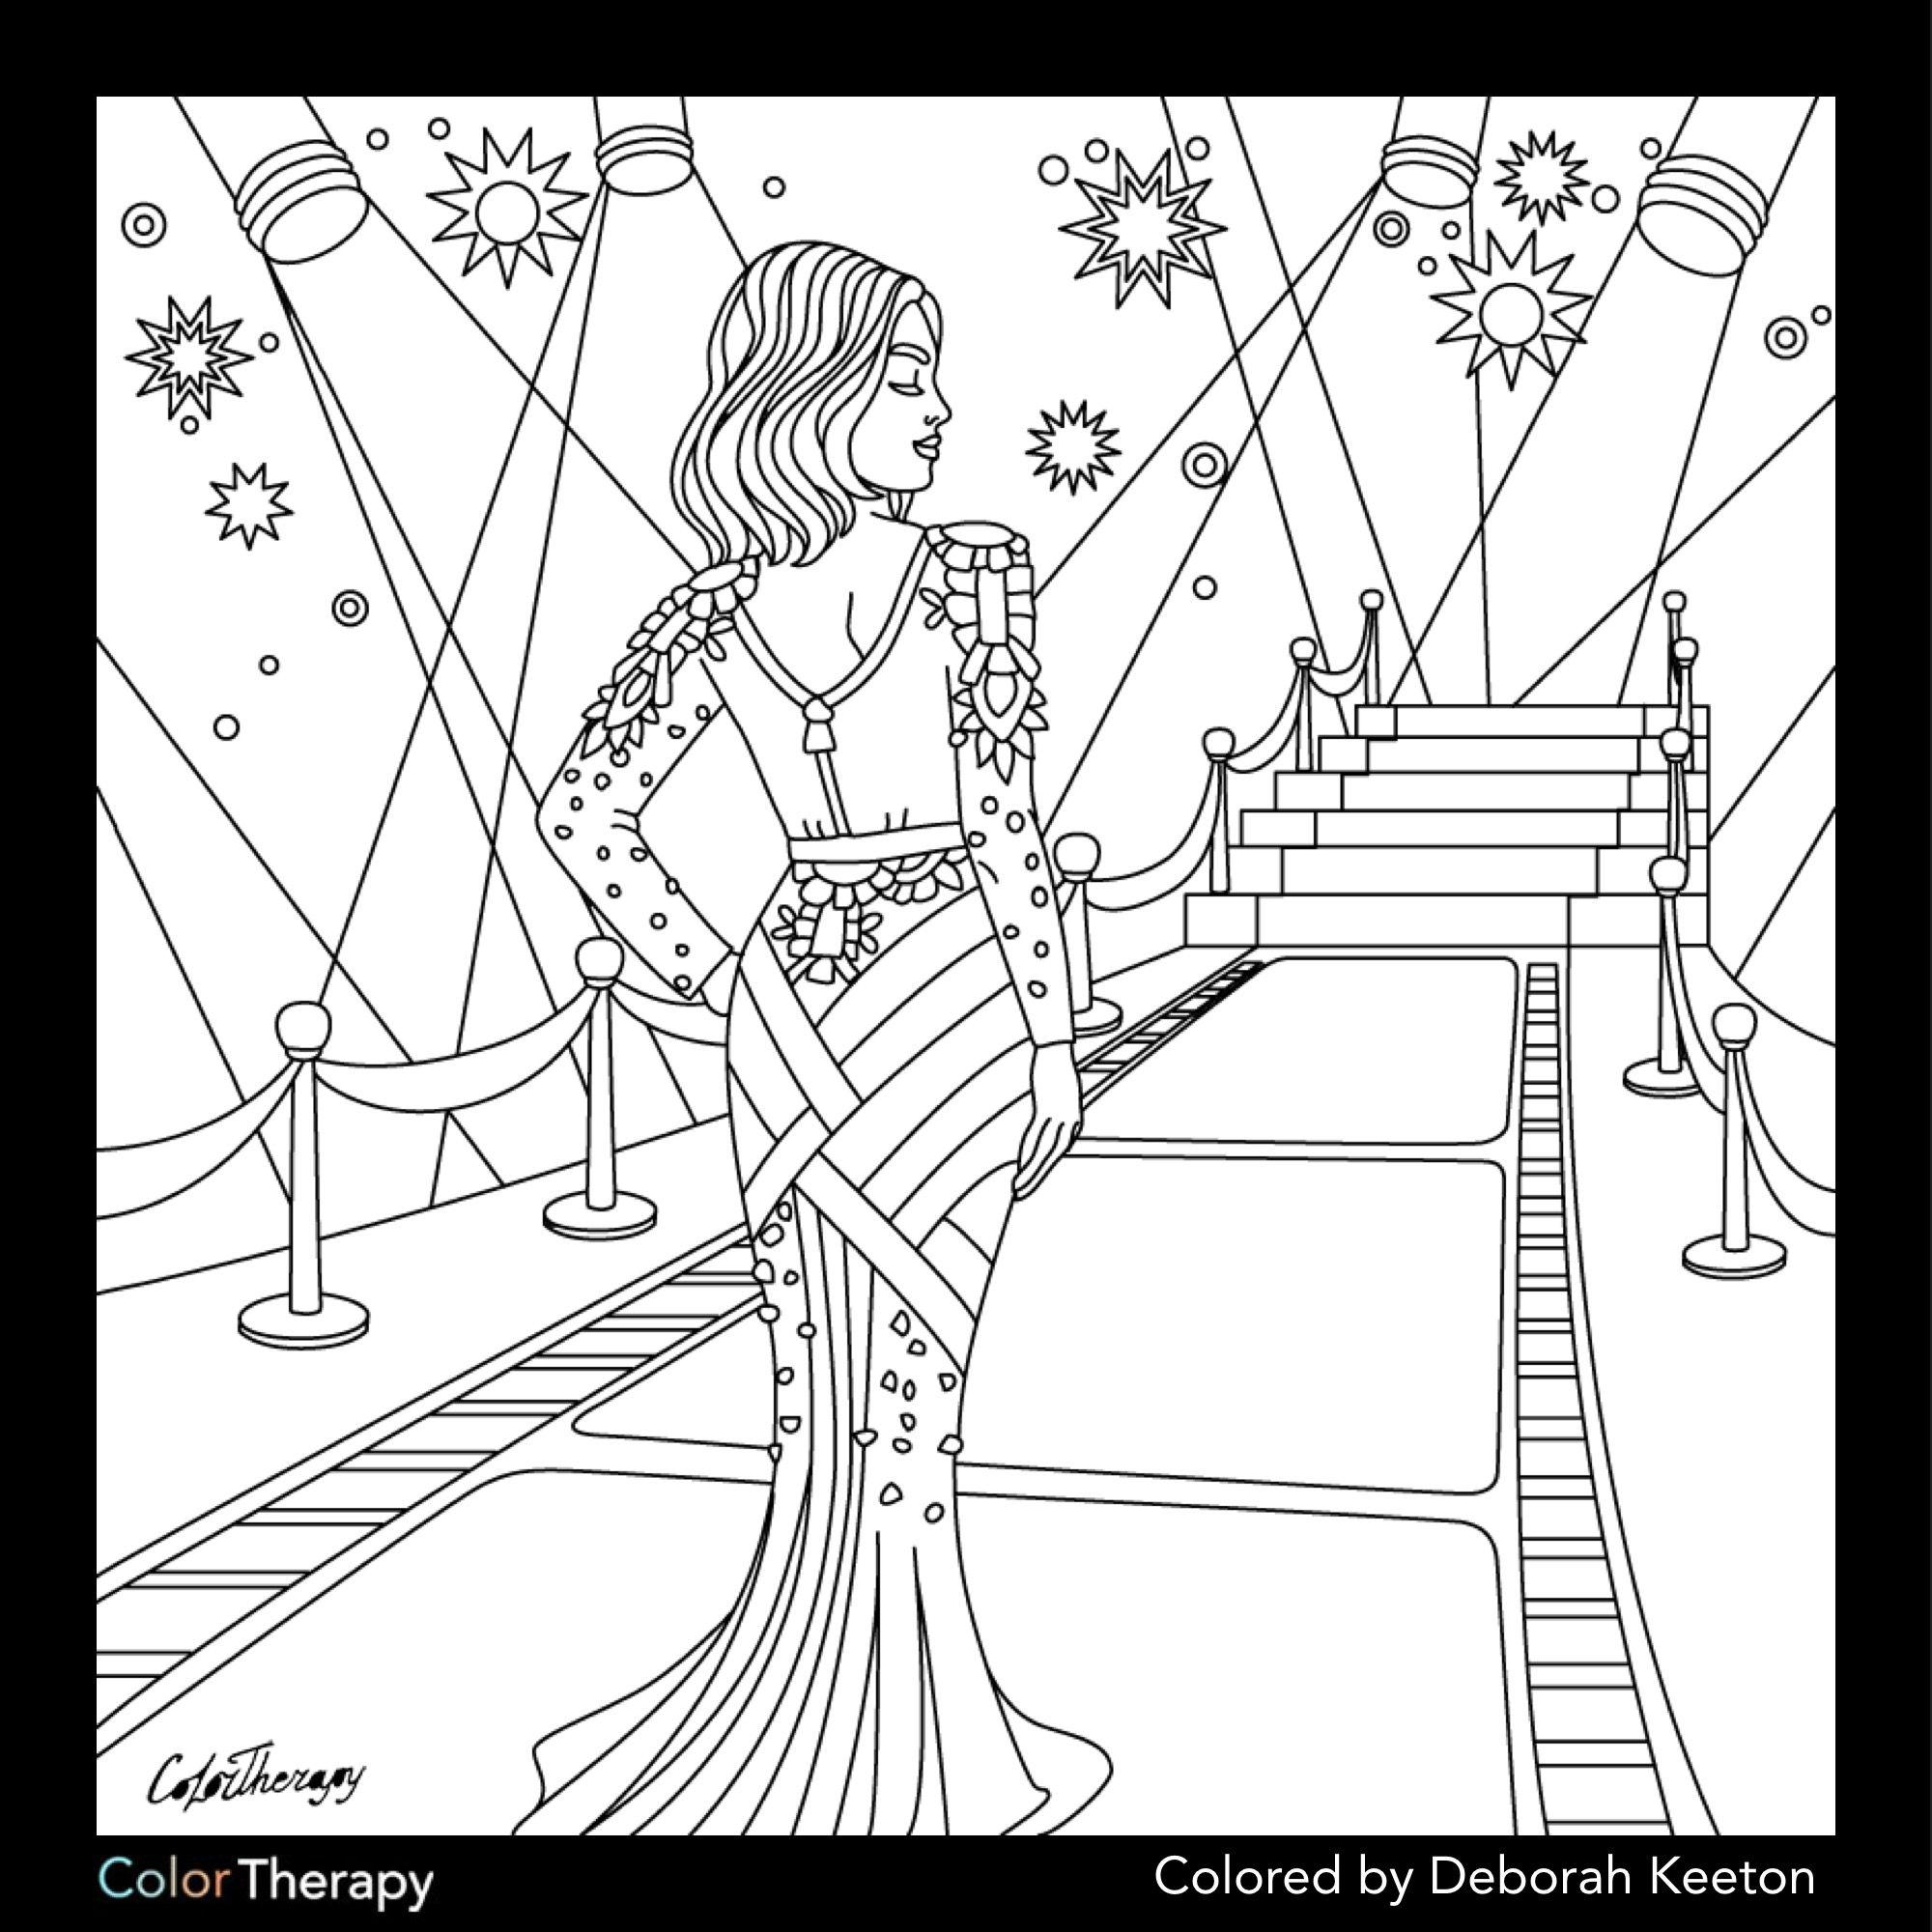 Pin von Kayle Ayers auf Adult Coloring | Printables | Pinterest ...